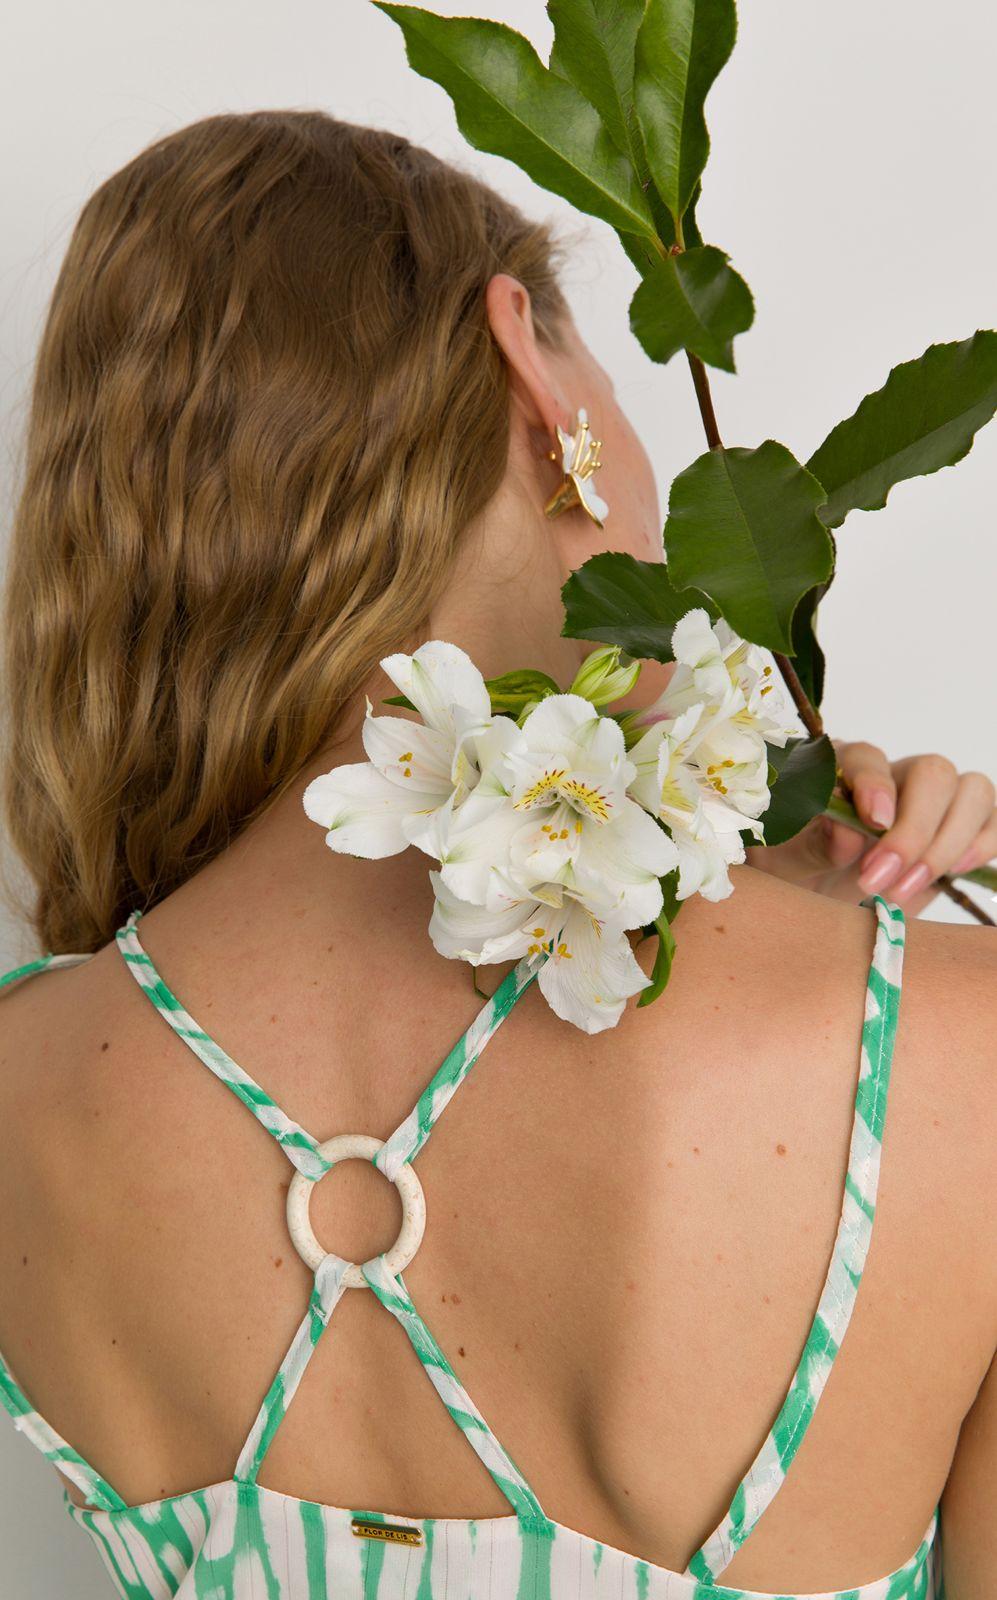 Regata Flor de Lis solta estampa abstrata